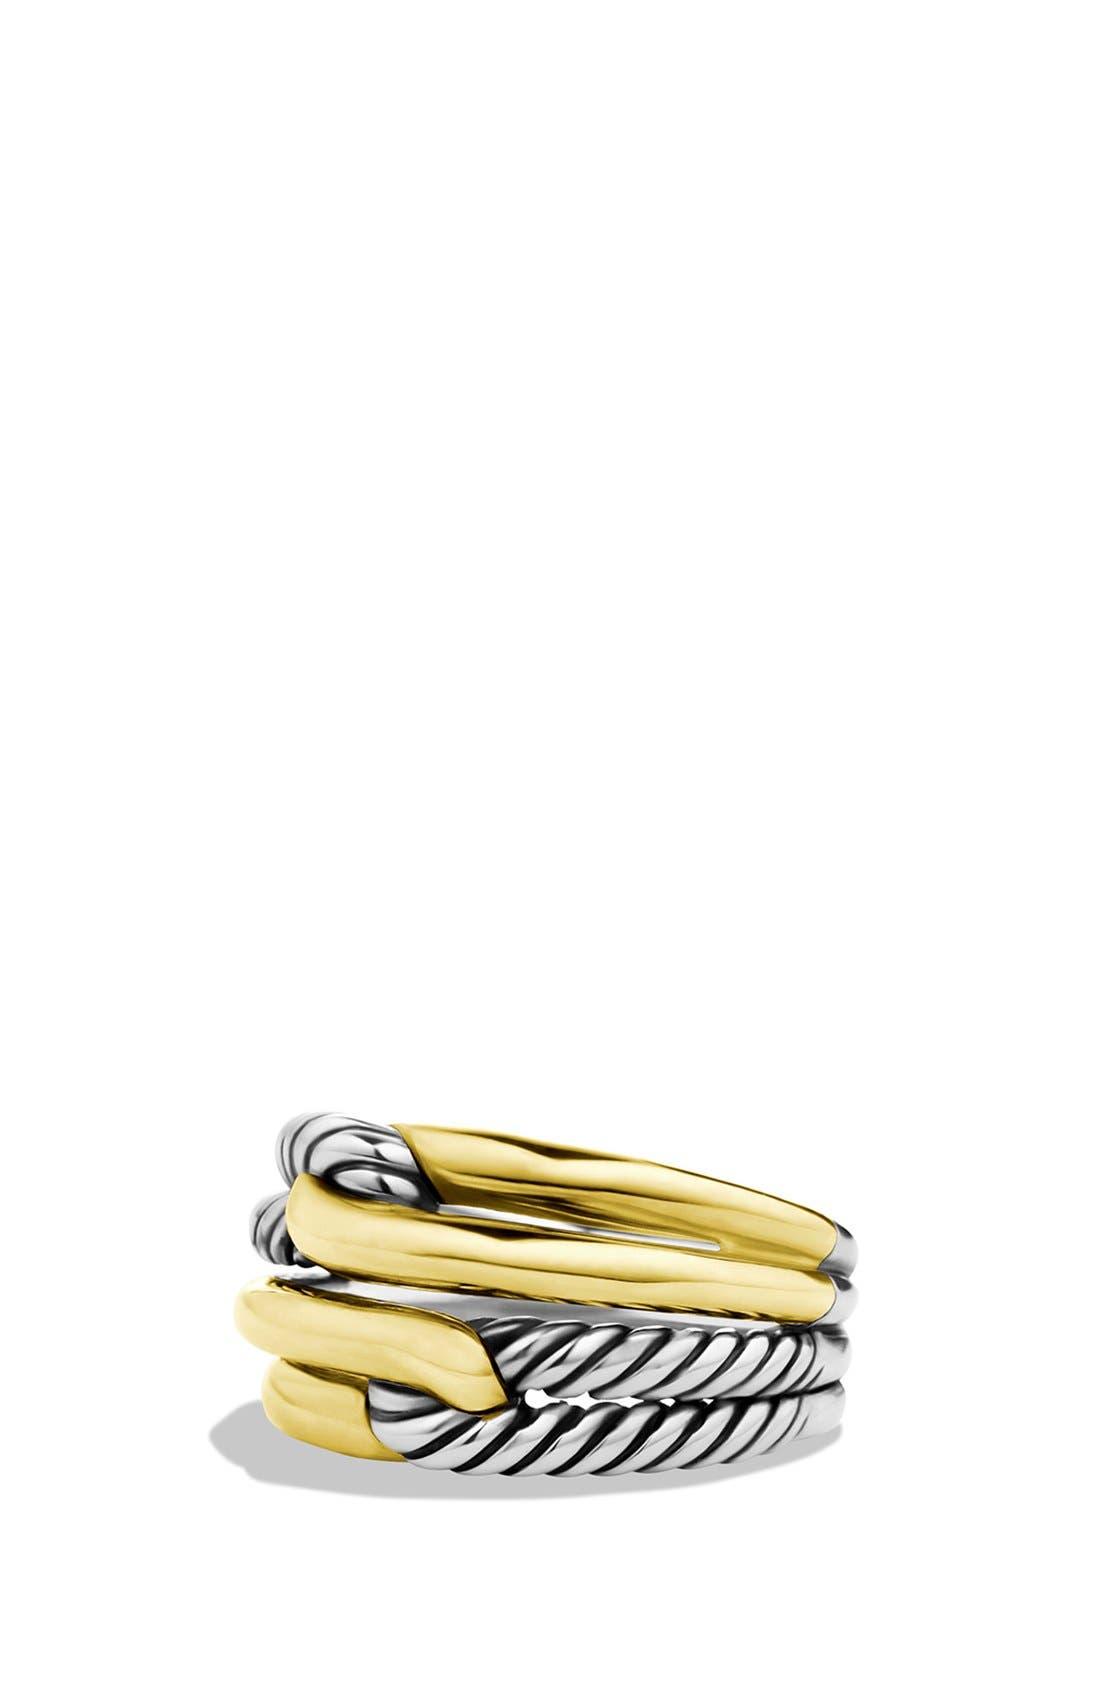 Main Image - David Yurman 'Labyrinth' Double-Loop Ring with Gold